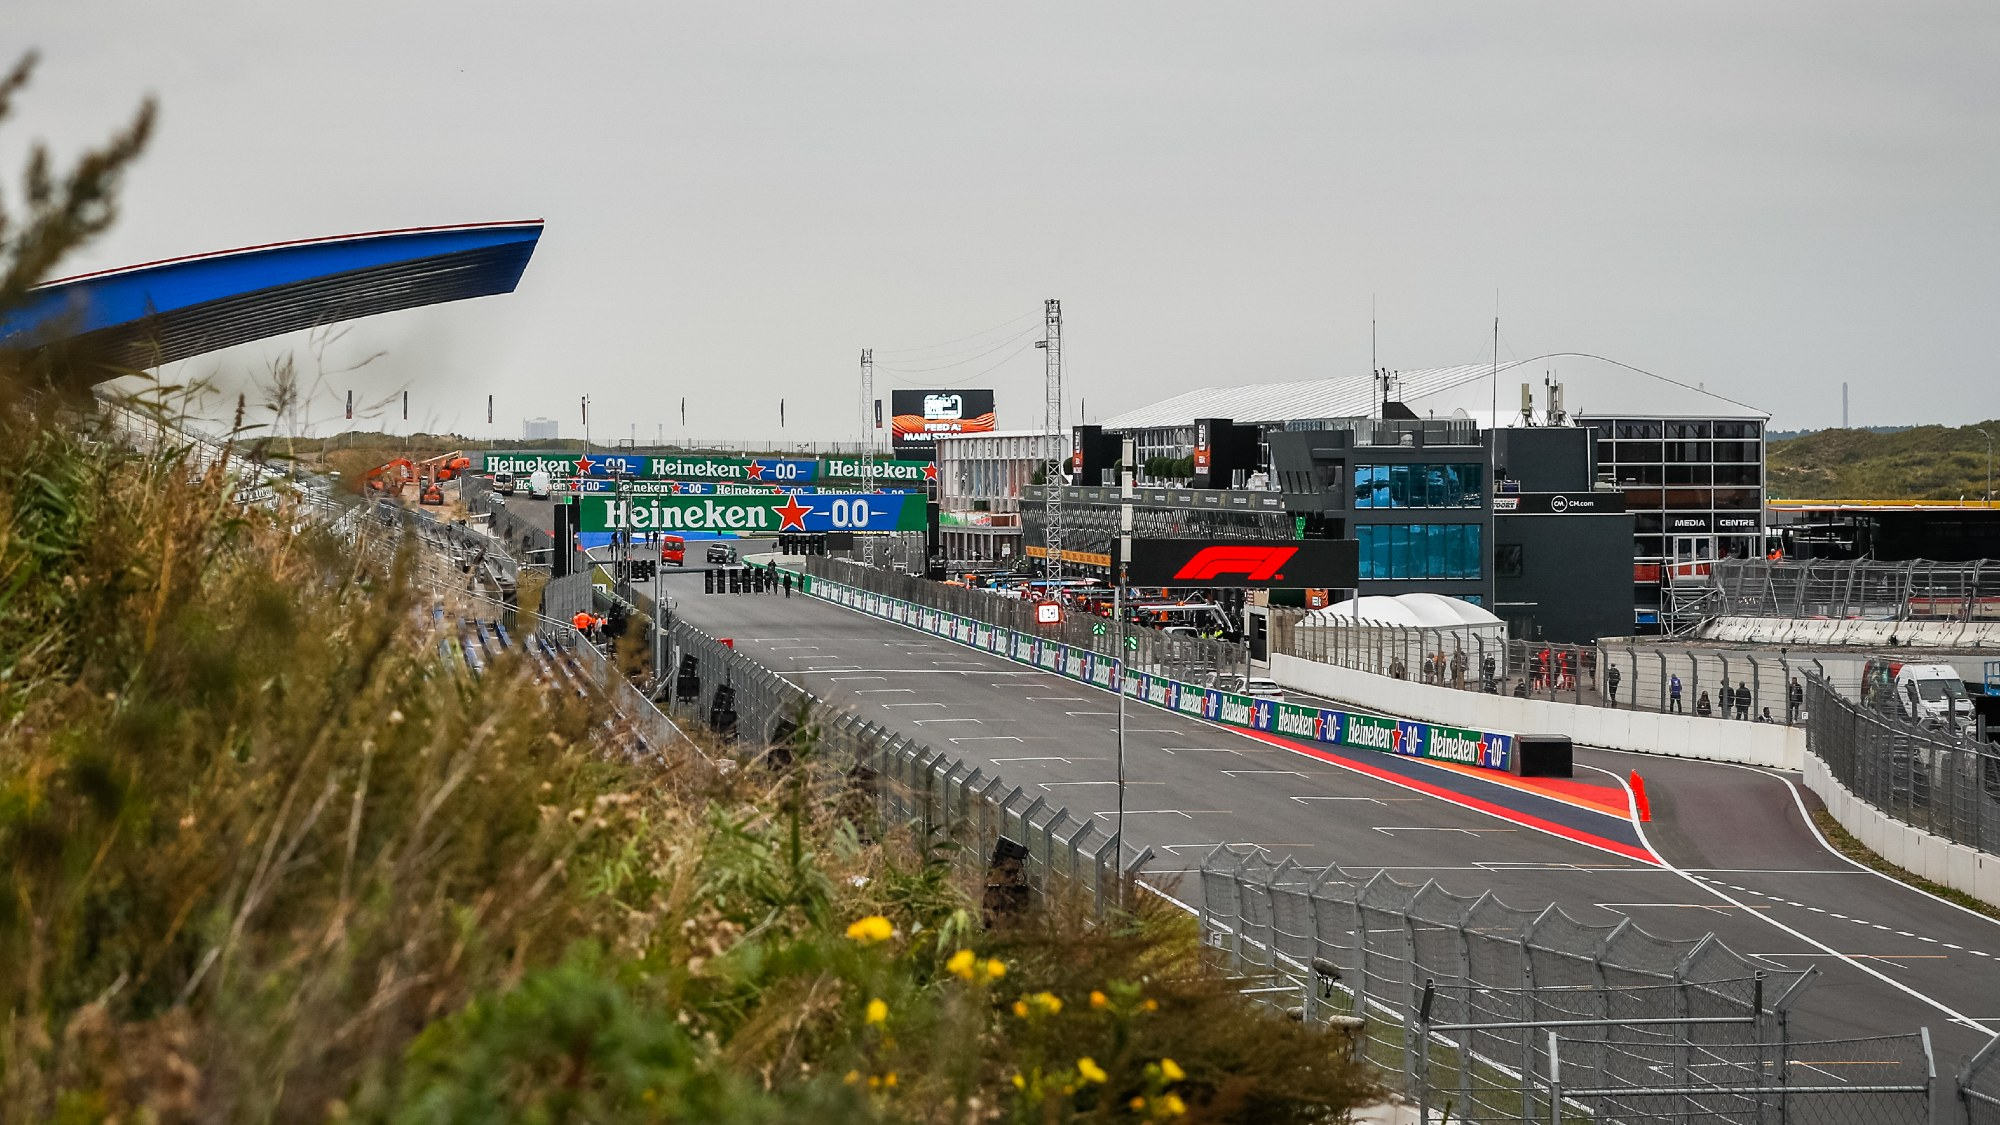 Zandvoort, 2021 Dutch GP